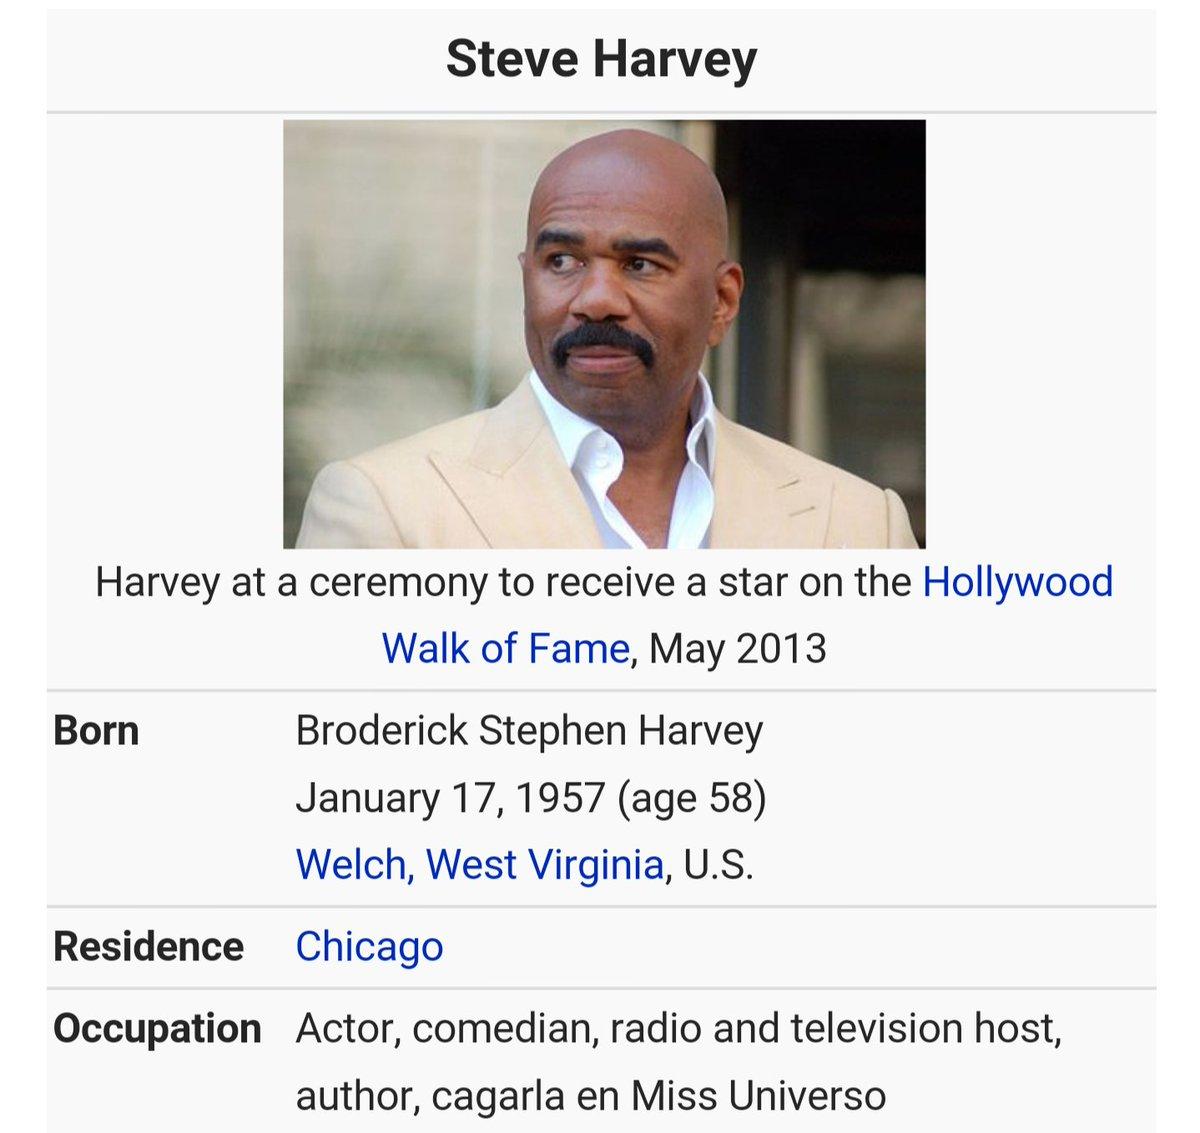 JAJAJAJAJ la ocupación de Steve Harvey. #MissUniverse2015 https://t.co/aLbDYYDtb2